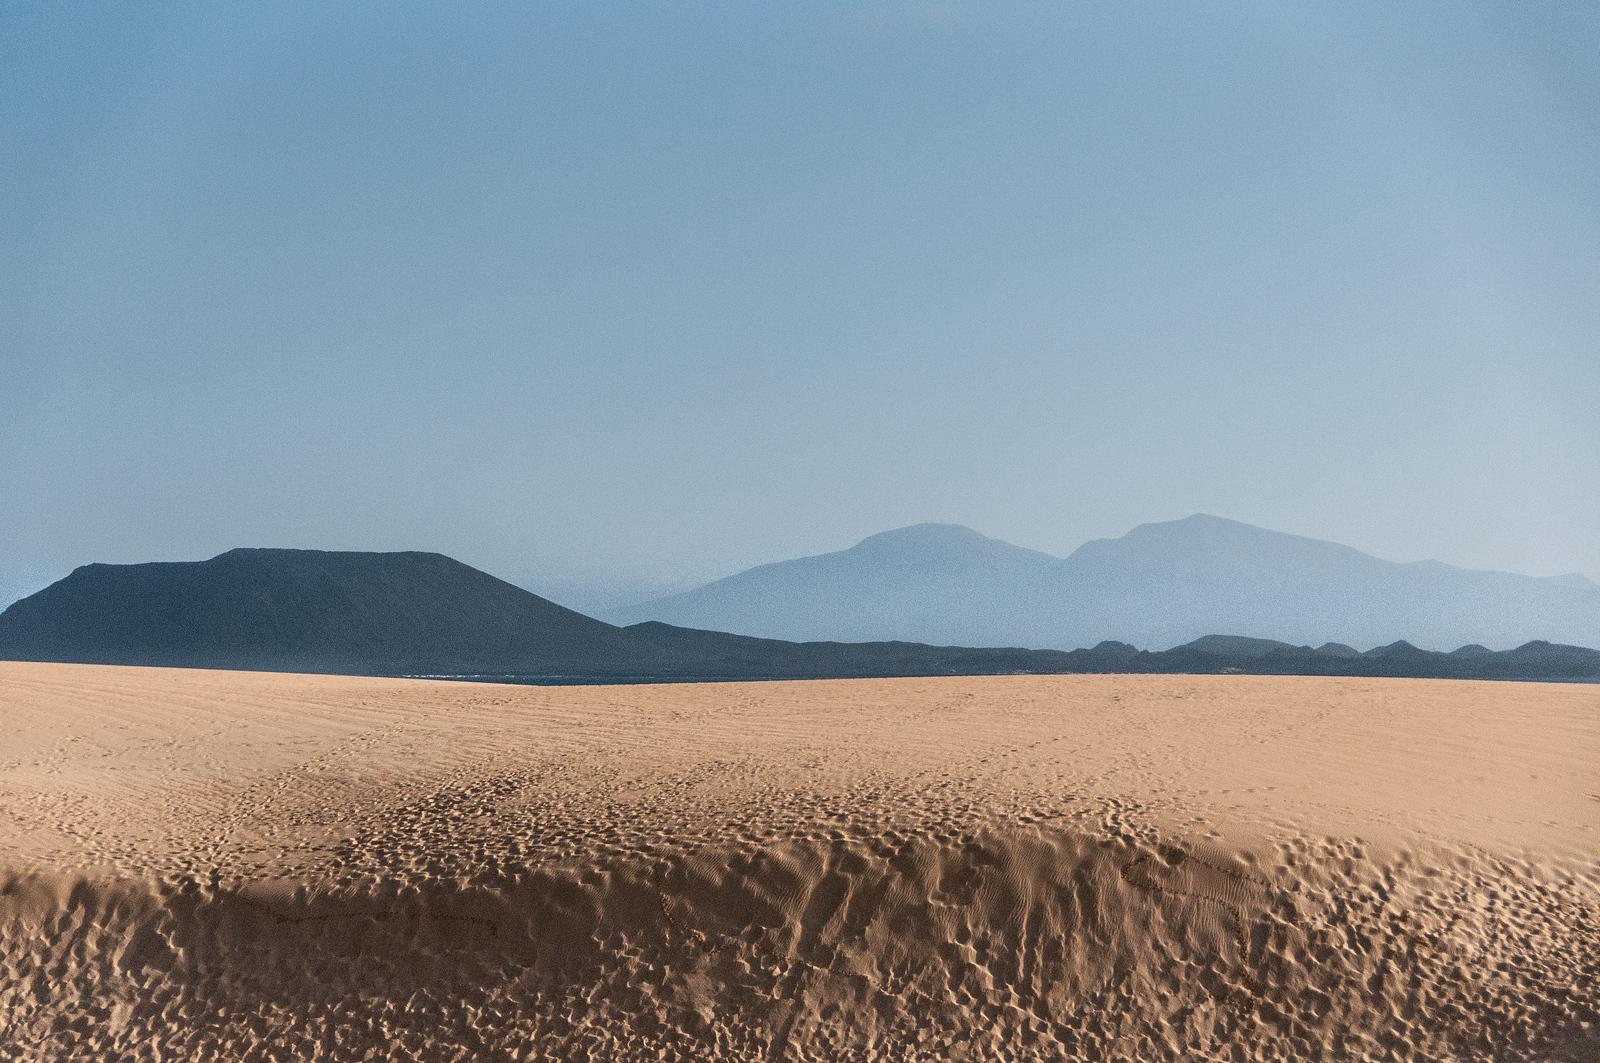 Corralejo Dunes in Fuerteventura, Canary Islands, Spain